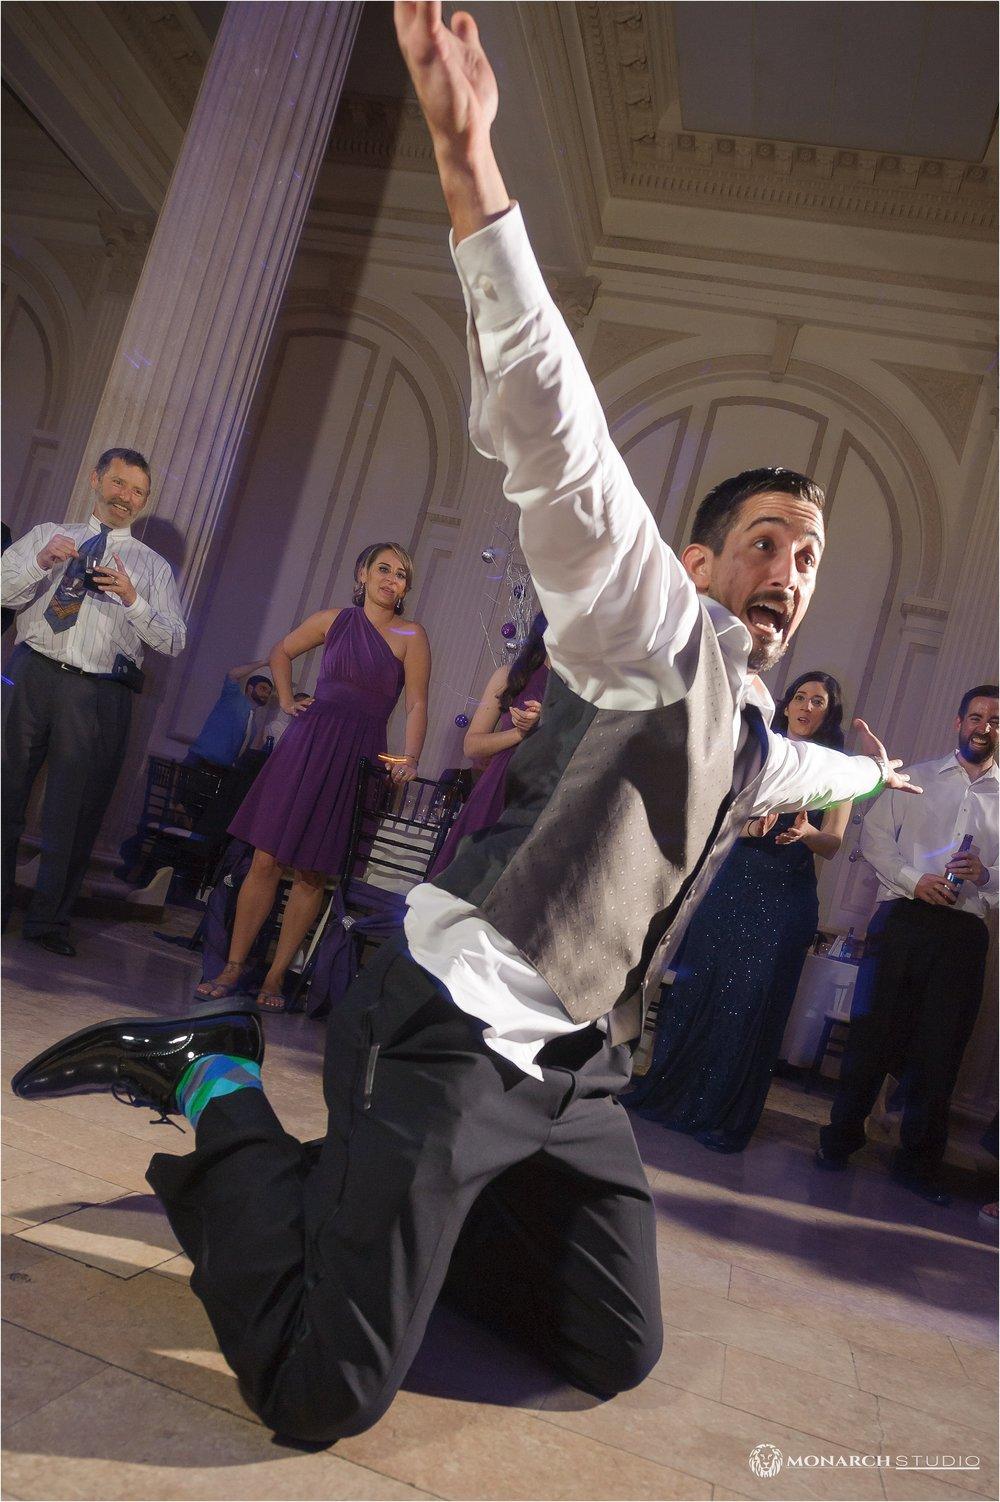 st-augustine-wedding-photographer-treasury-on-the-plaza-076.jpg